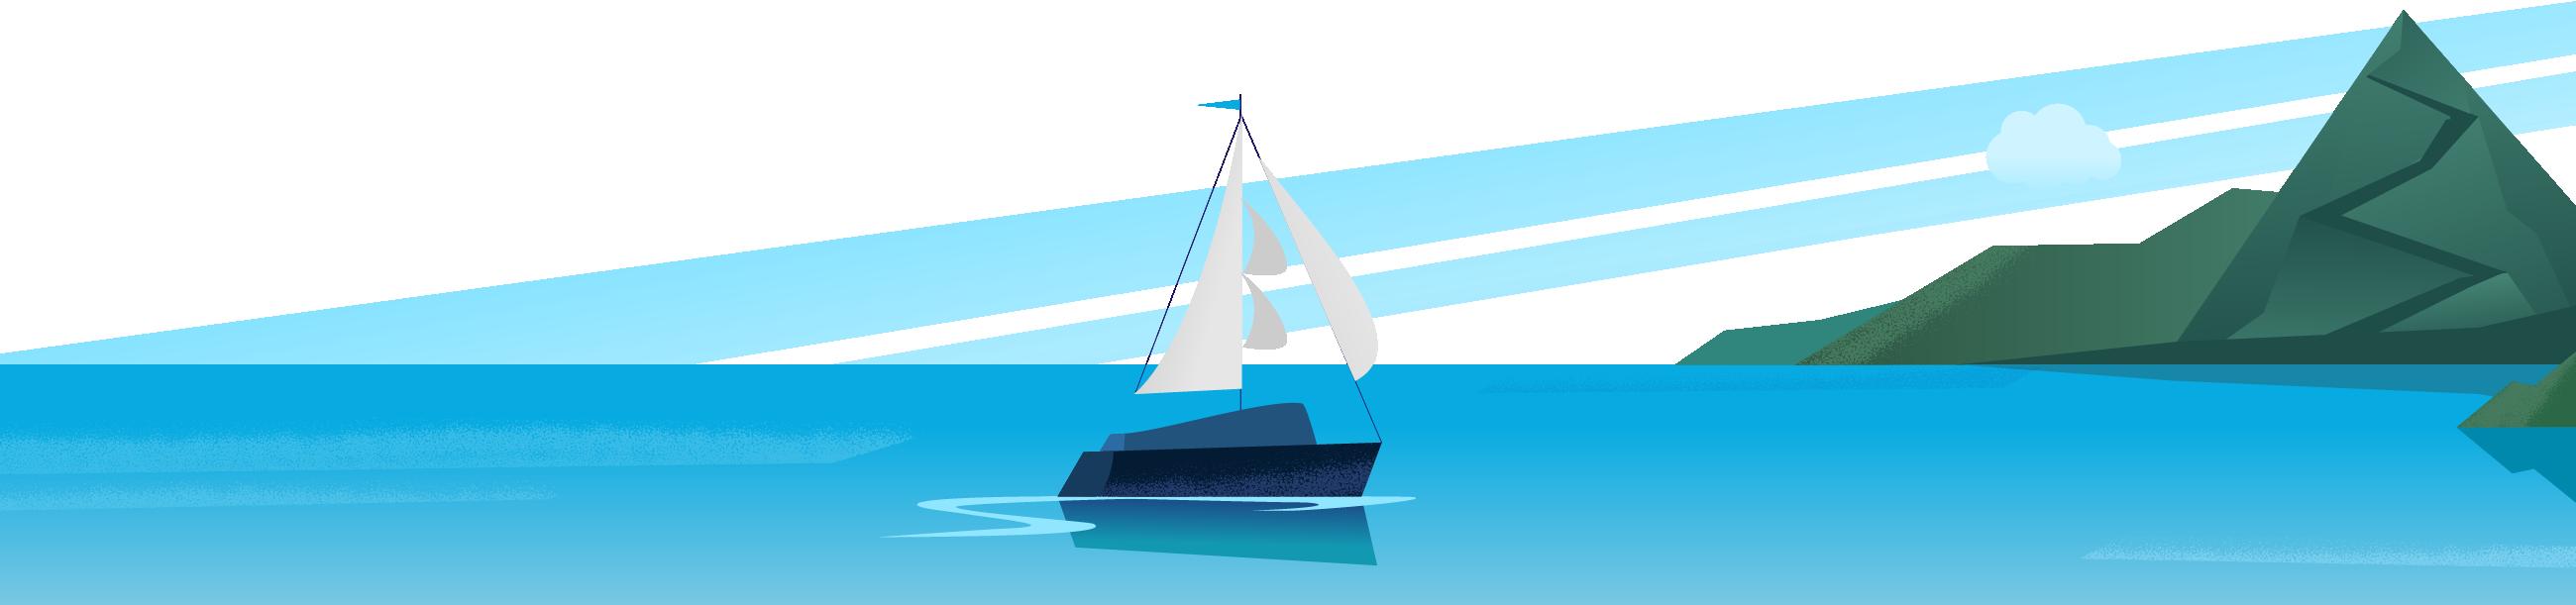 CloudKettle sailboat approaching an island